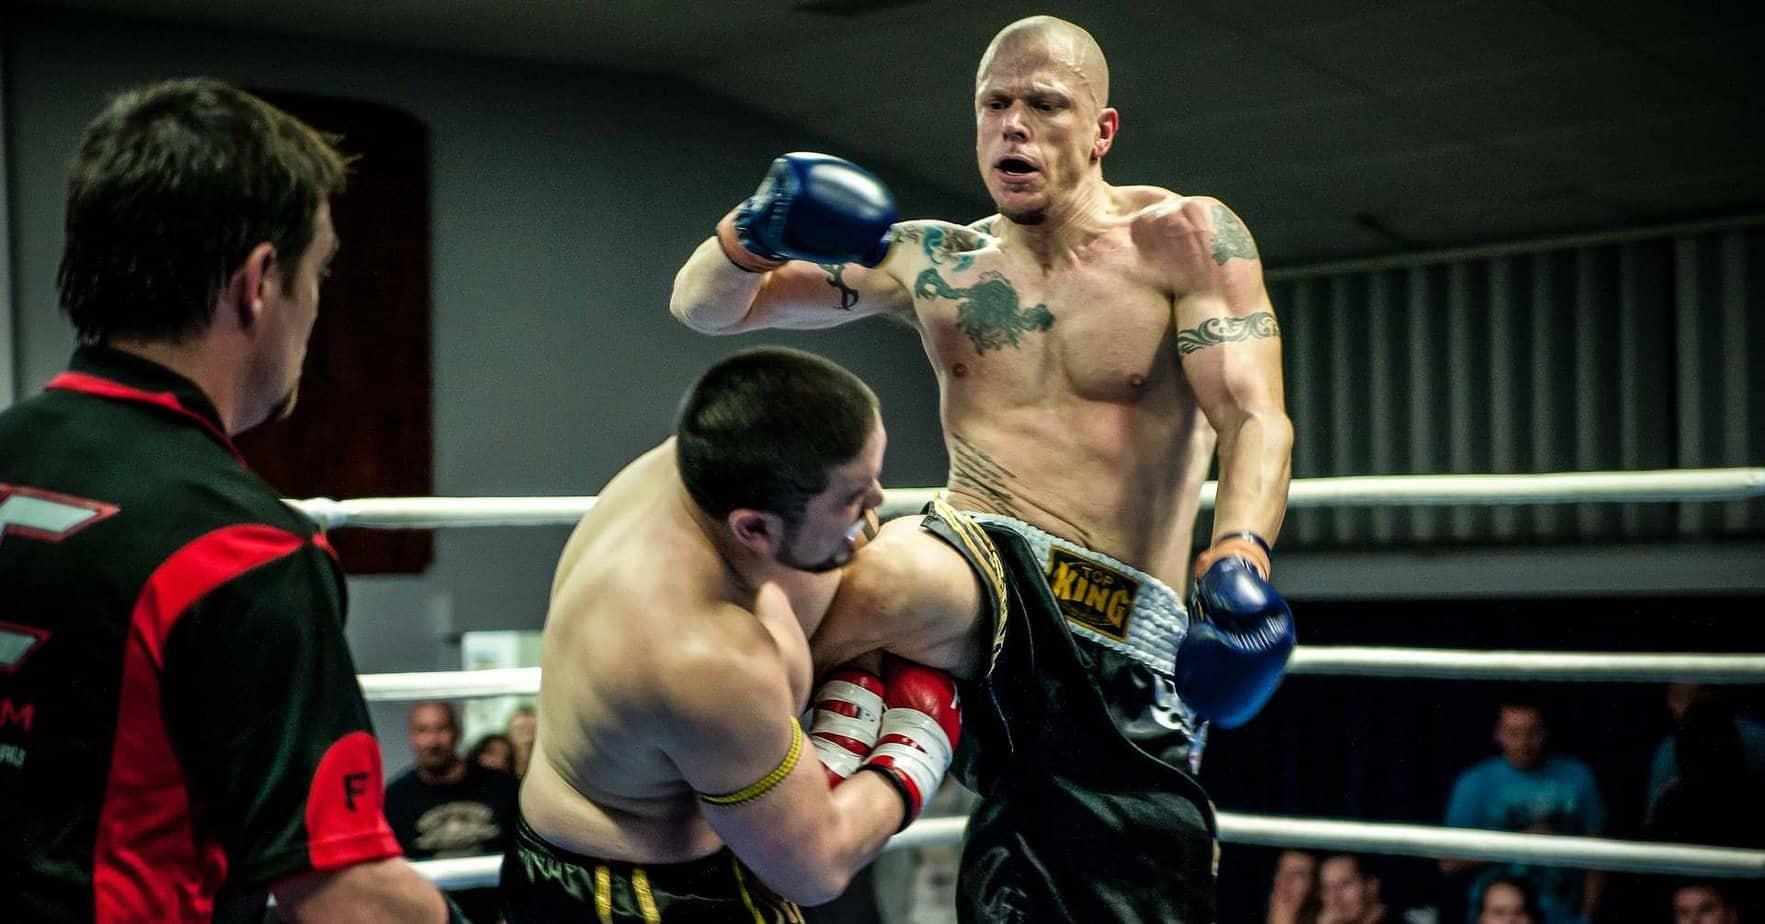 Muay Thai Scoring System: How Are Muay Thai Fights Scored?